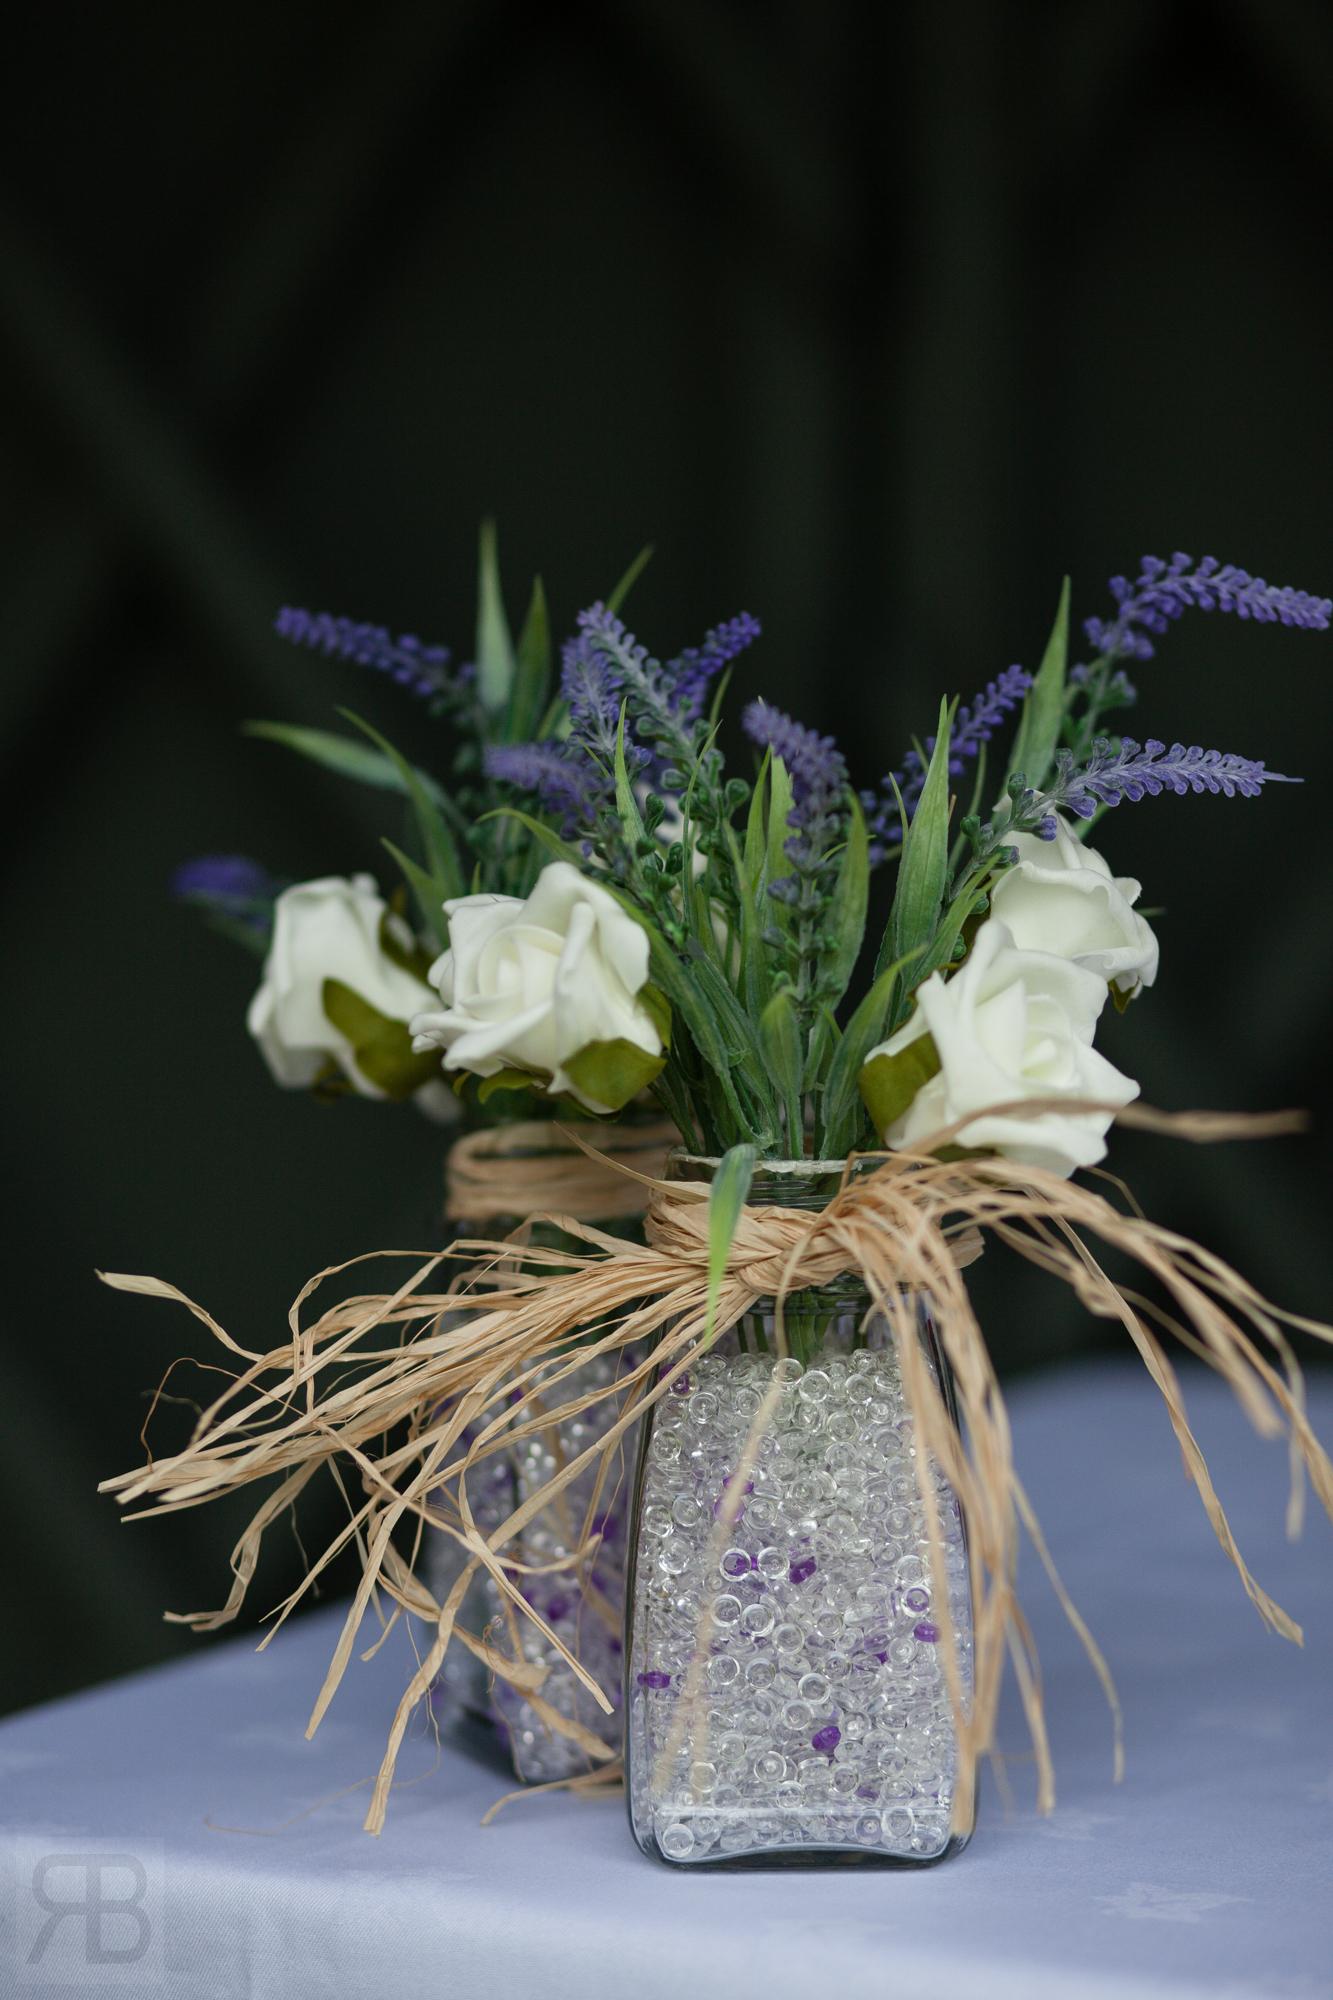 110715_LisaCraigJohnson_Wedding_5449041_WebWM.jpg